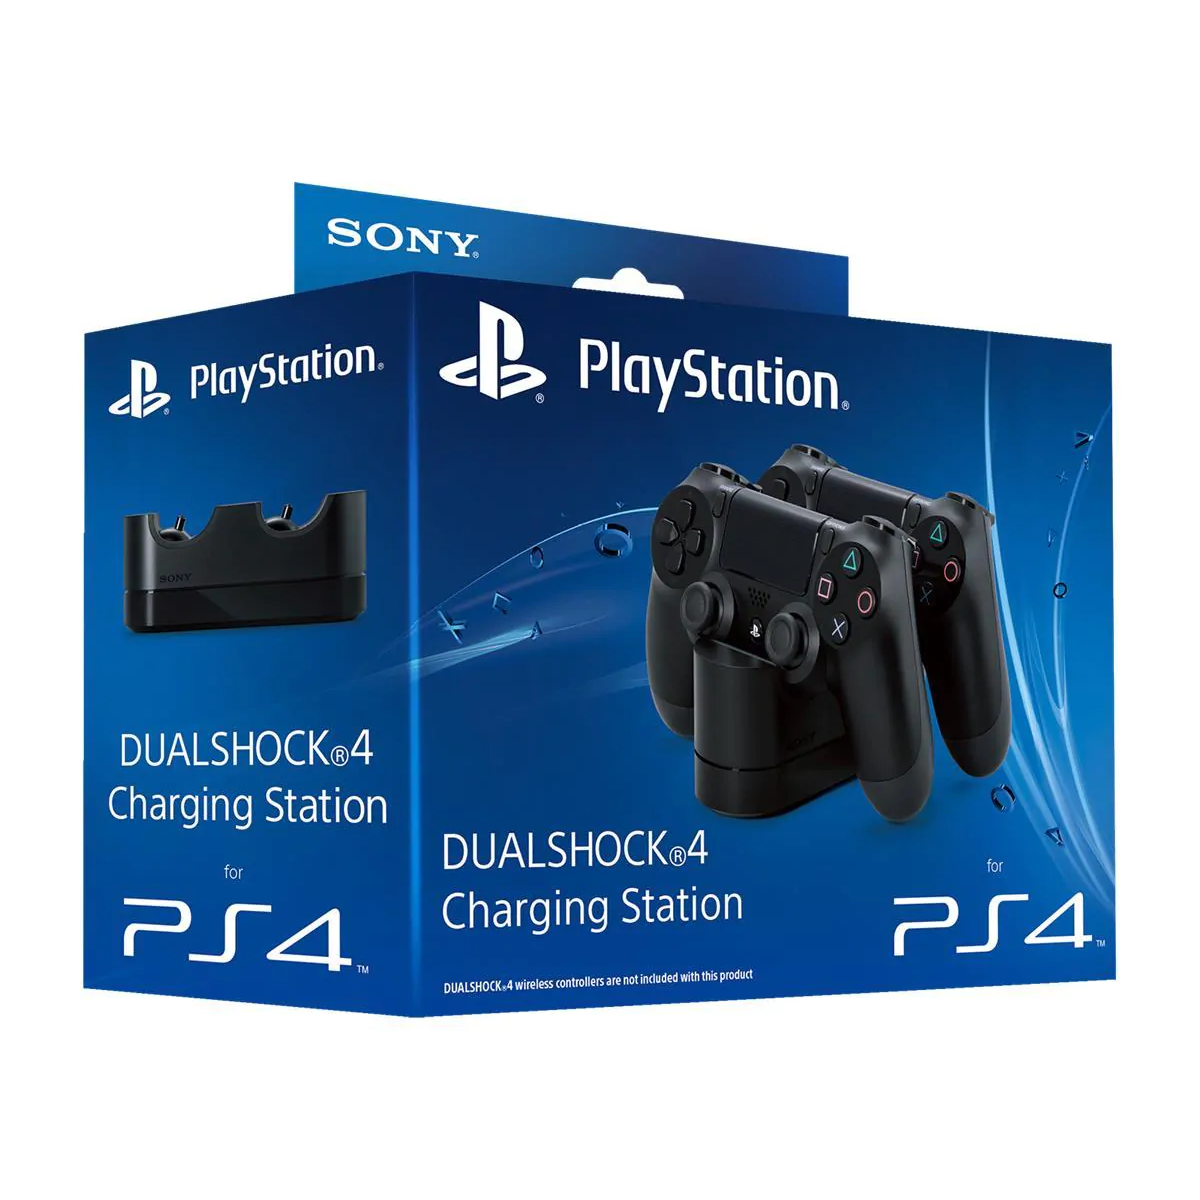 Sony Playstation DualShock 4 Charging Station (UK/EU)